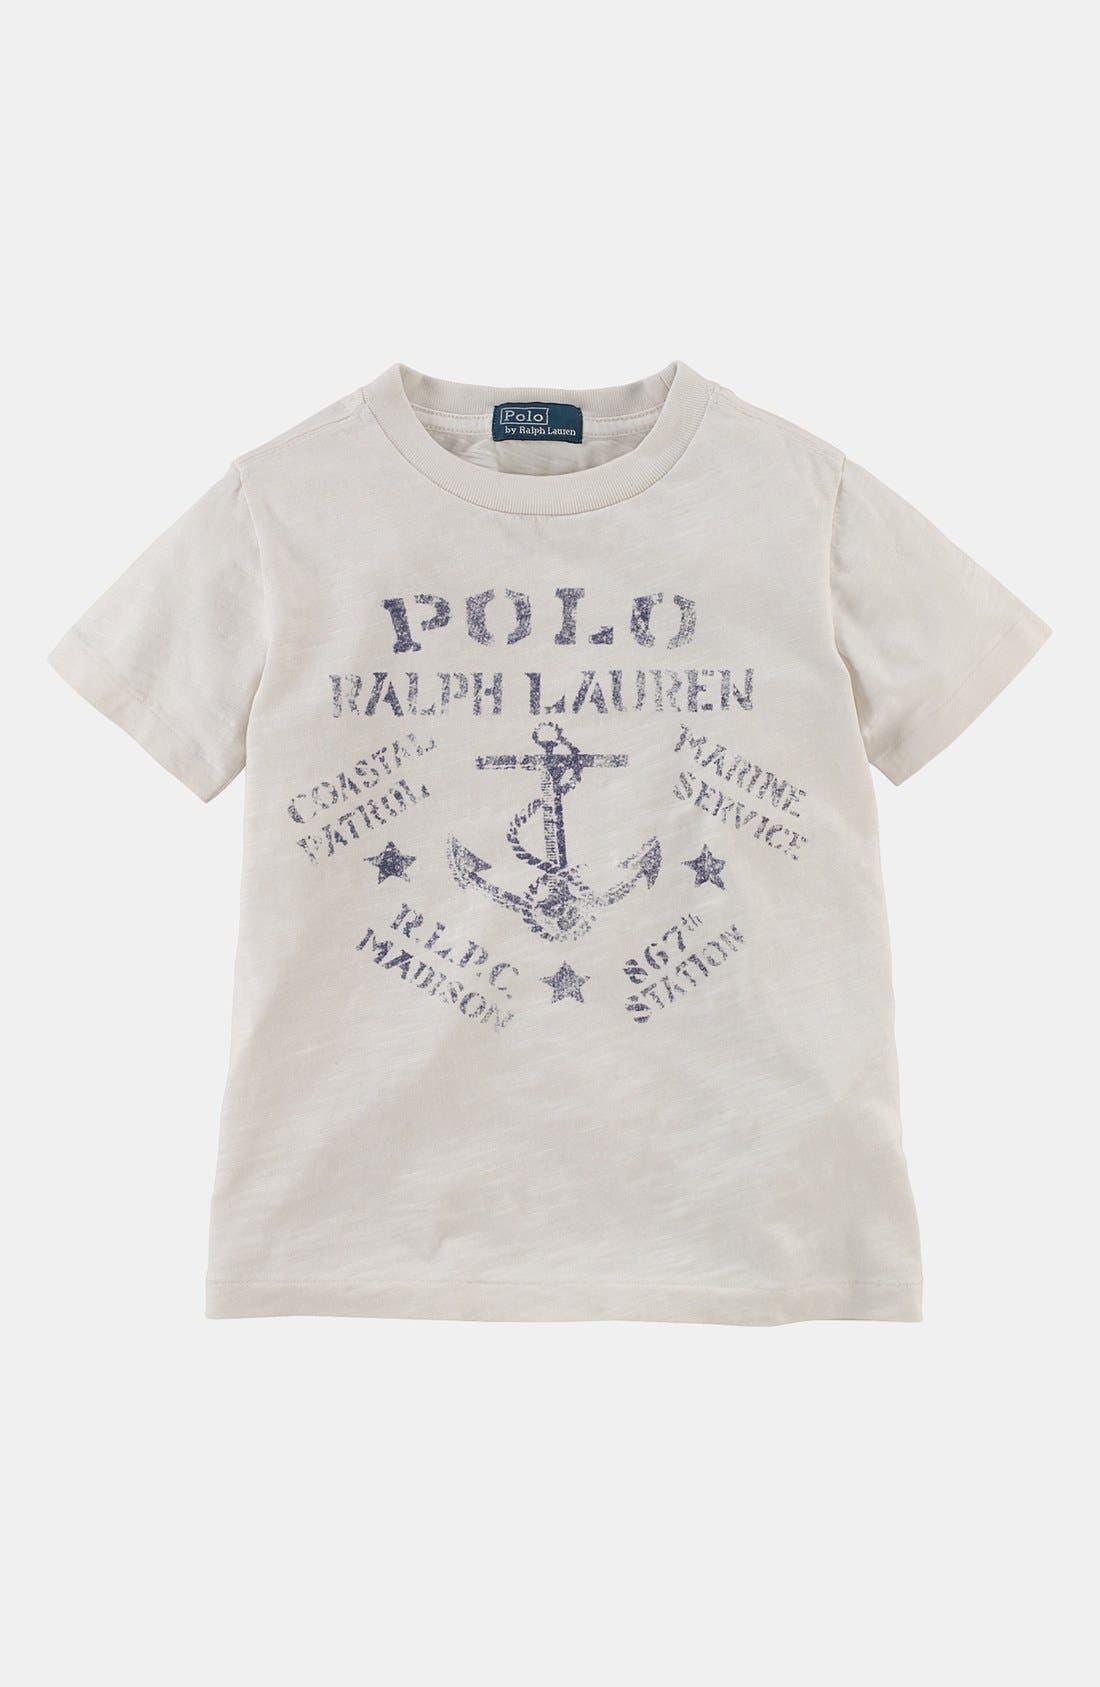 Main Image - Polo Ralph Lauren T-Shirt (Toddler Boys)